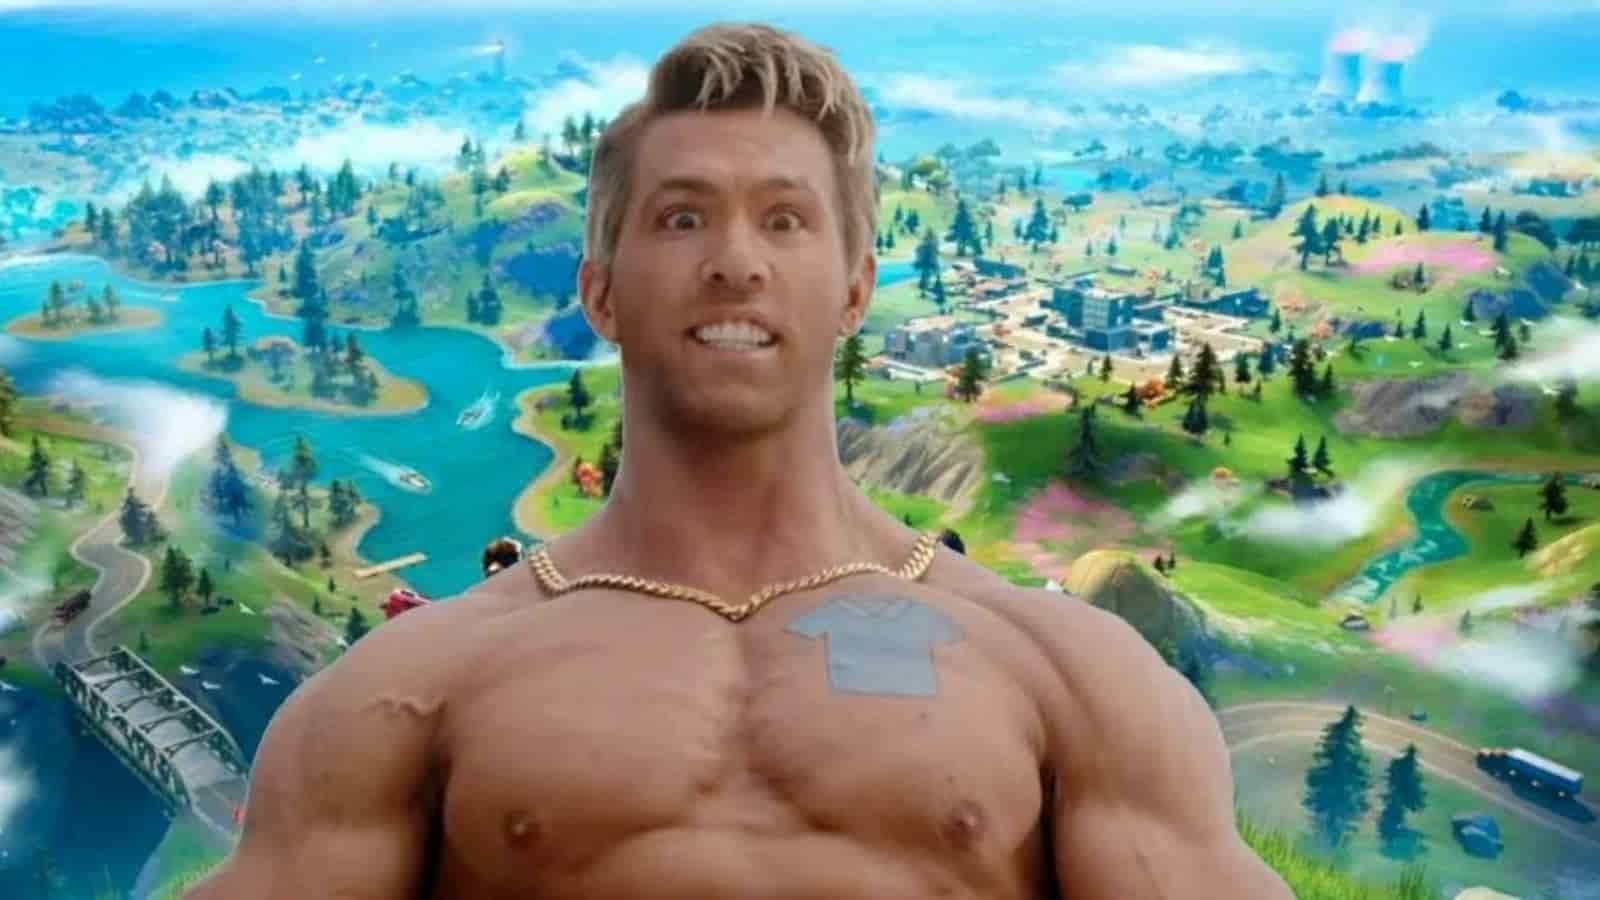 Fortnite Dude Skin: Ryan Reynolds Free Guy New Skin in Season 7